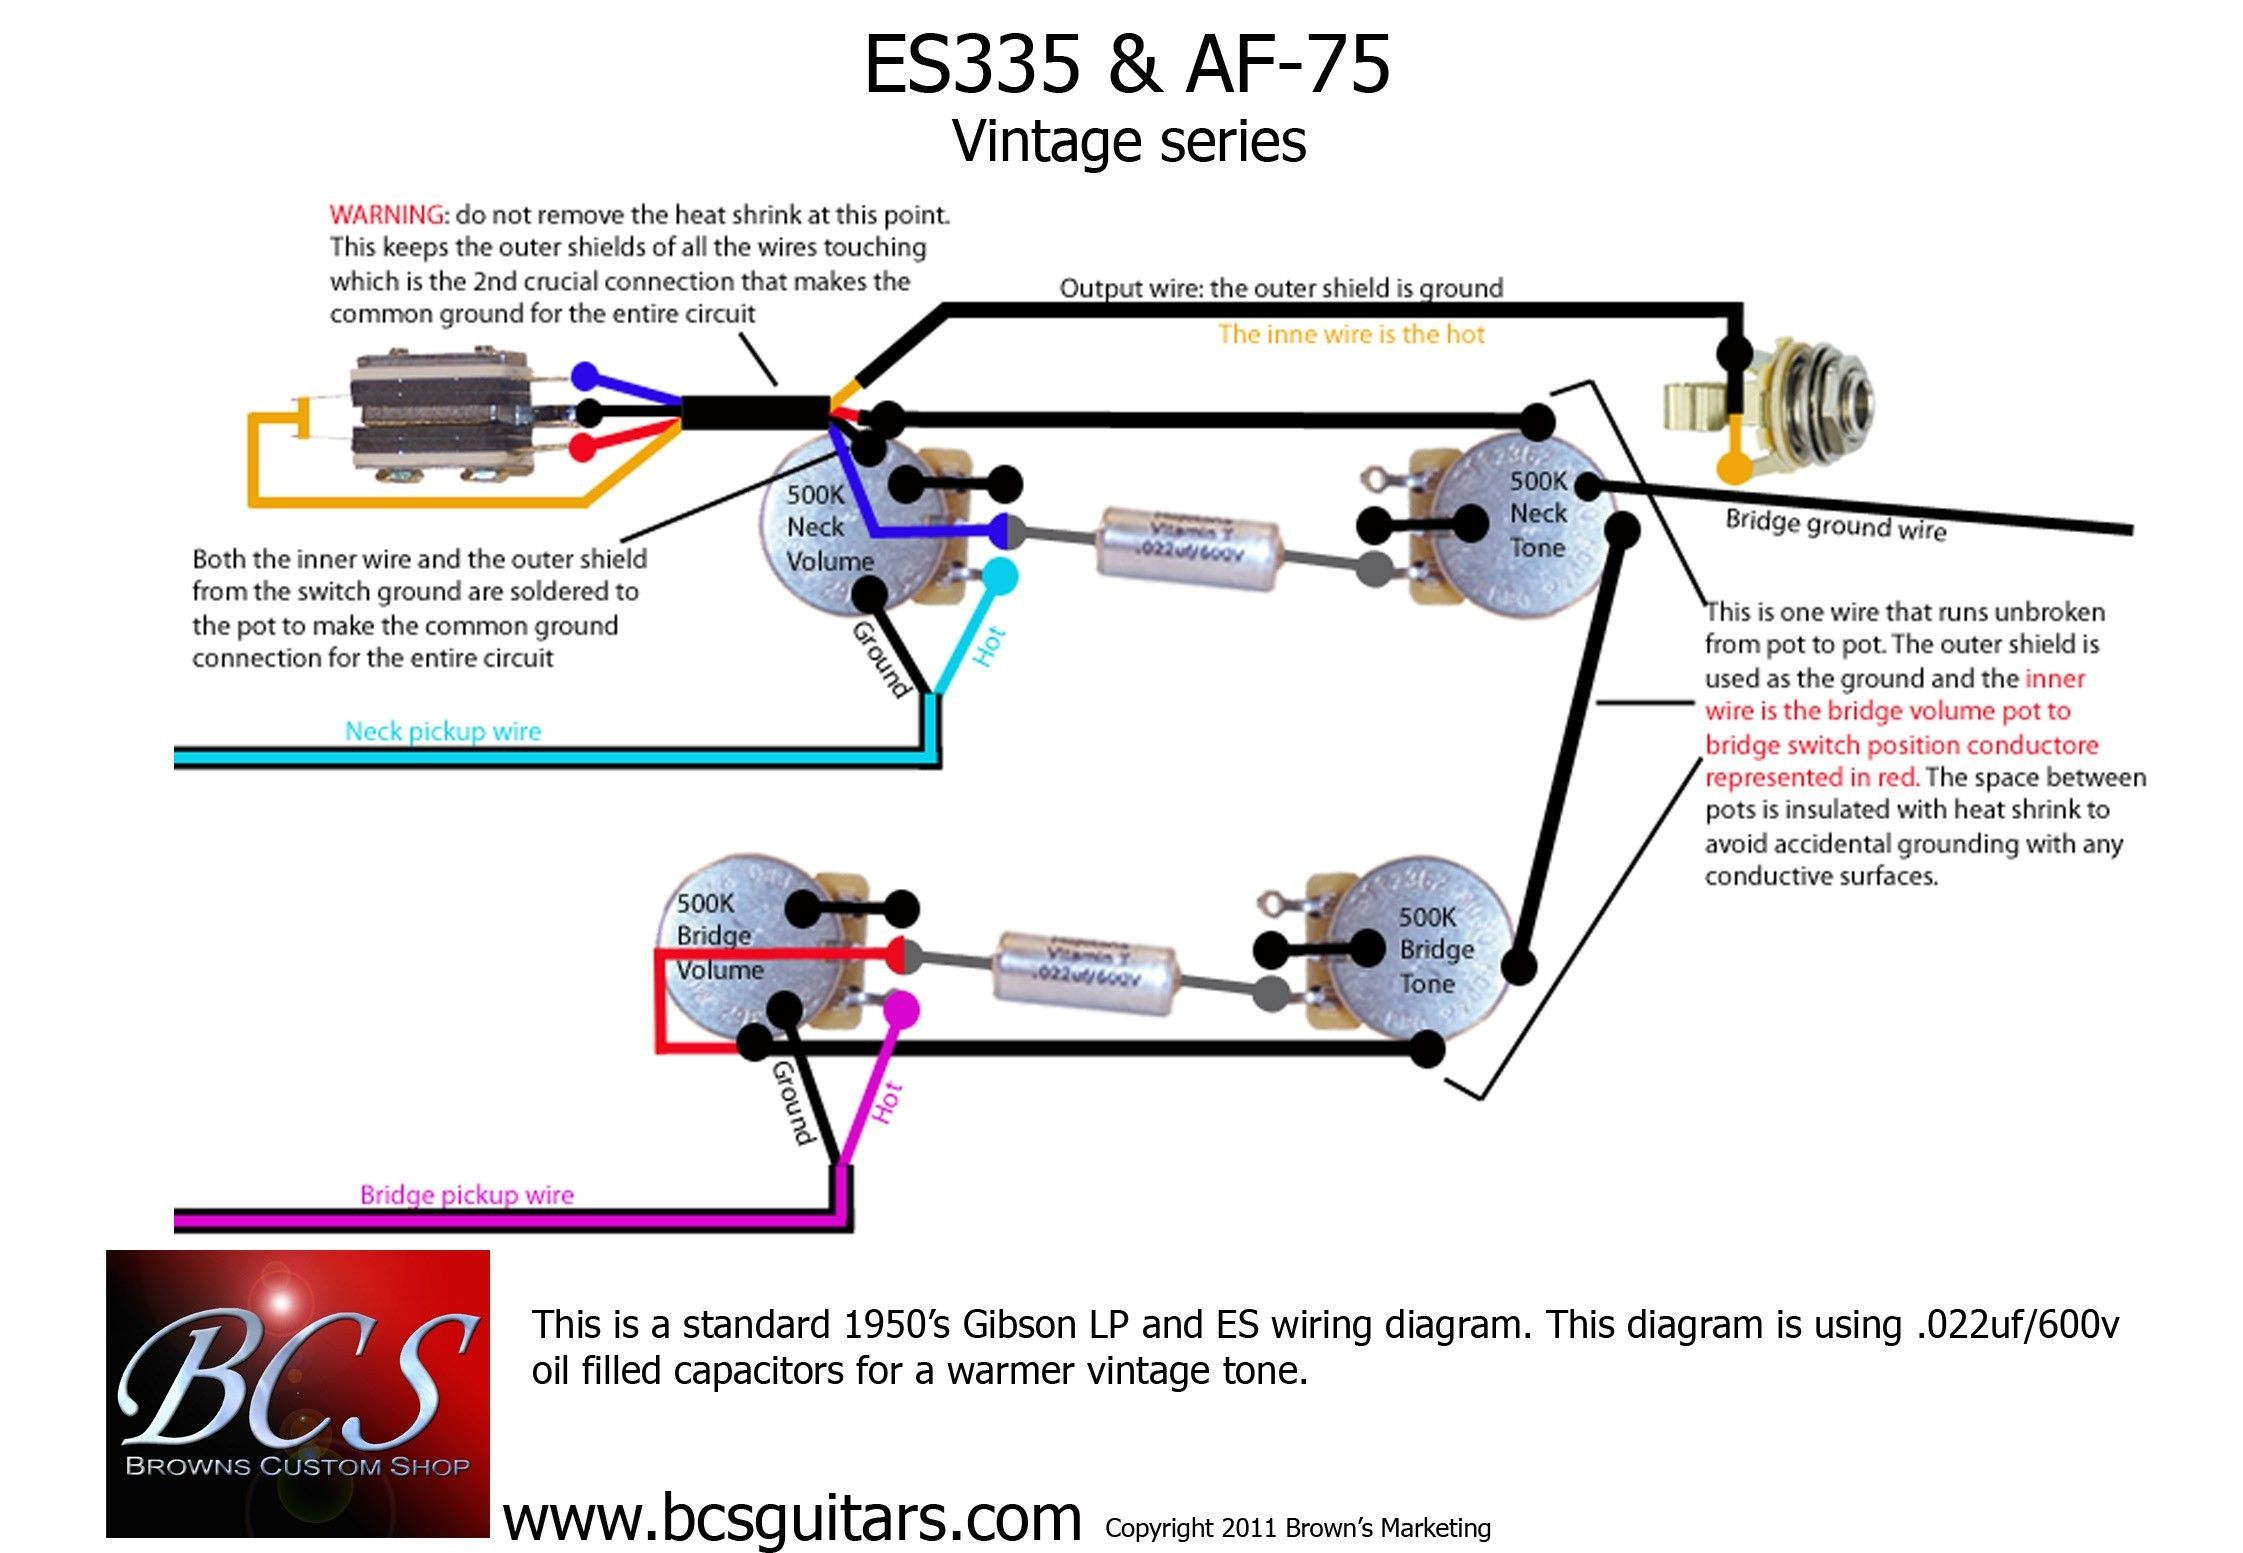 Es Wiring Diagram - Wiring Diagram 500 on retro epiphone humbucker diagram, jd 322 engine diagram, jaguar 4-way switch diagram, es 335 dimensions, gibson 335 wiring diagram, es 335 switch, classic 59 pick up diagram,